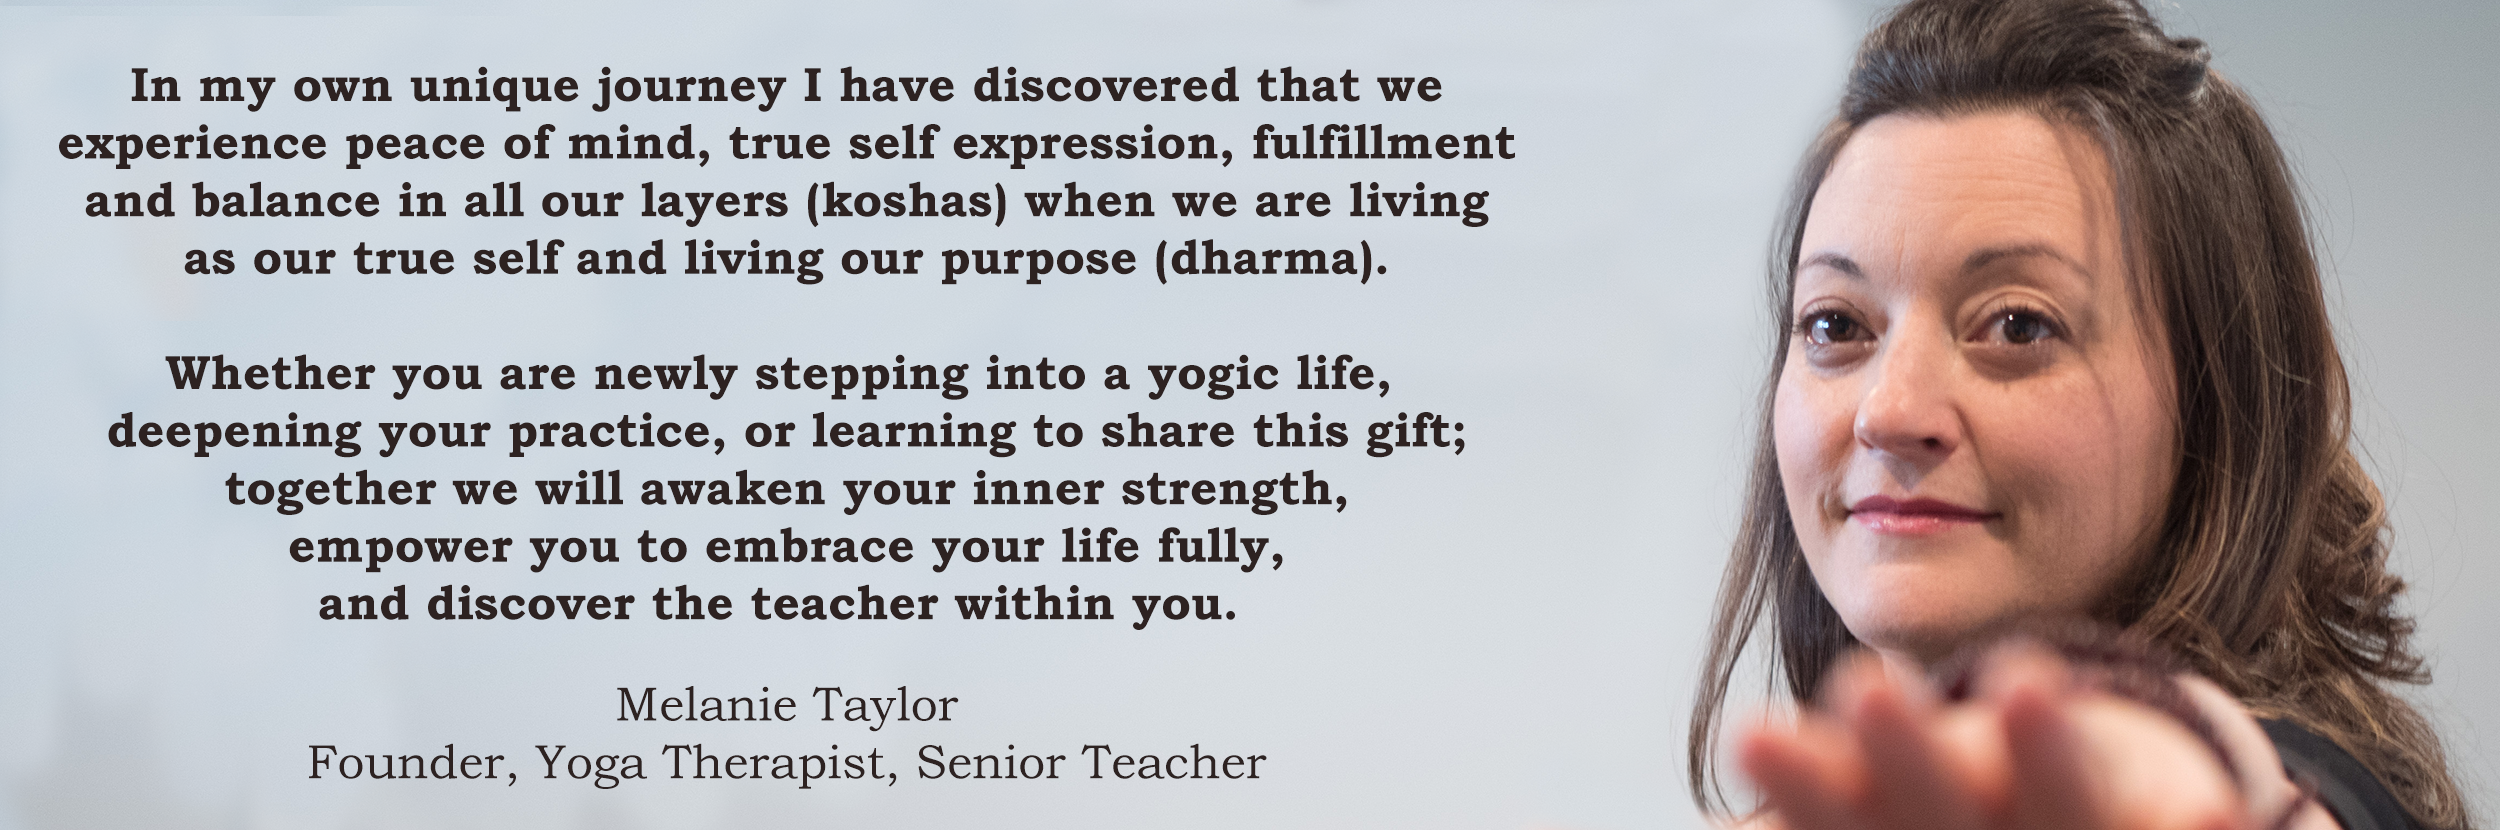 Life of Wellness Institute - ViniYoga Teacher Training